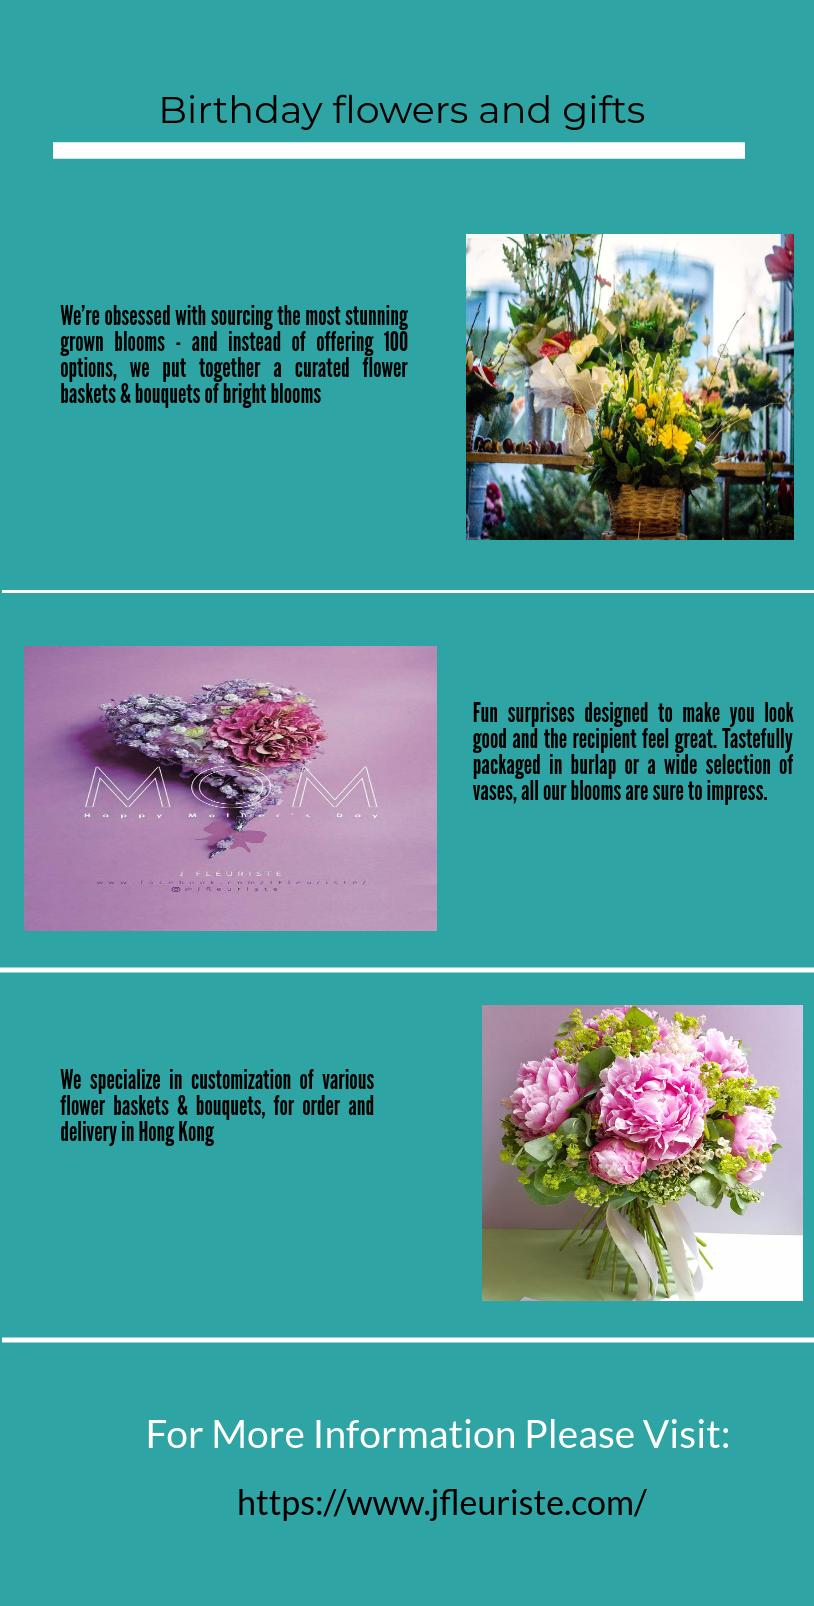 Jfleuriste makes the birthday special by sending a bir birthday descubre ideas sobre tiendas de flores izmirmasajfo